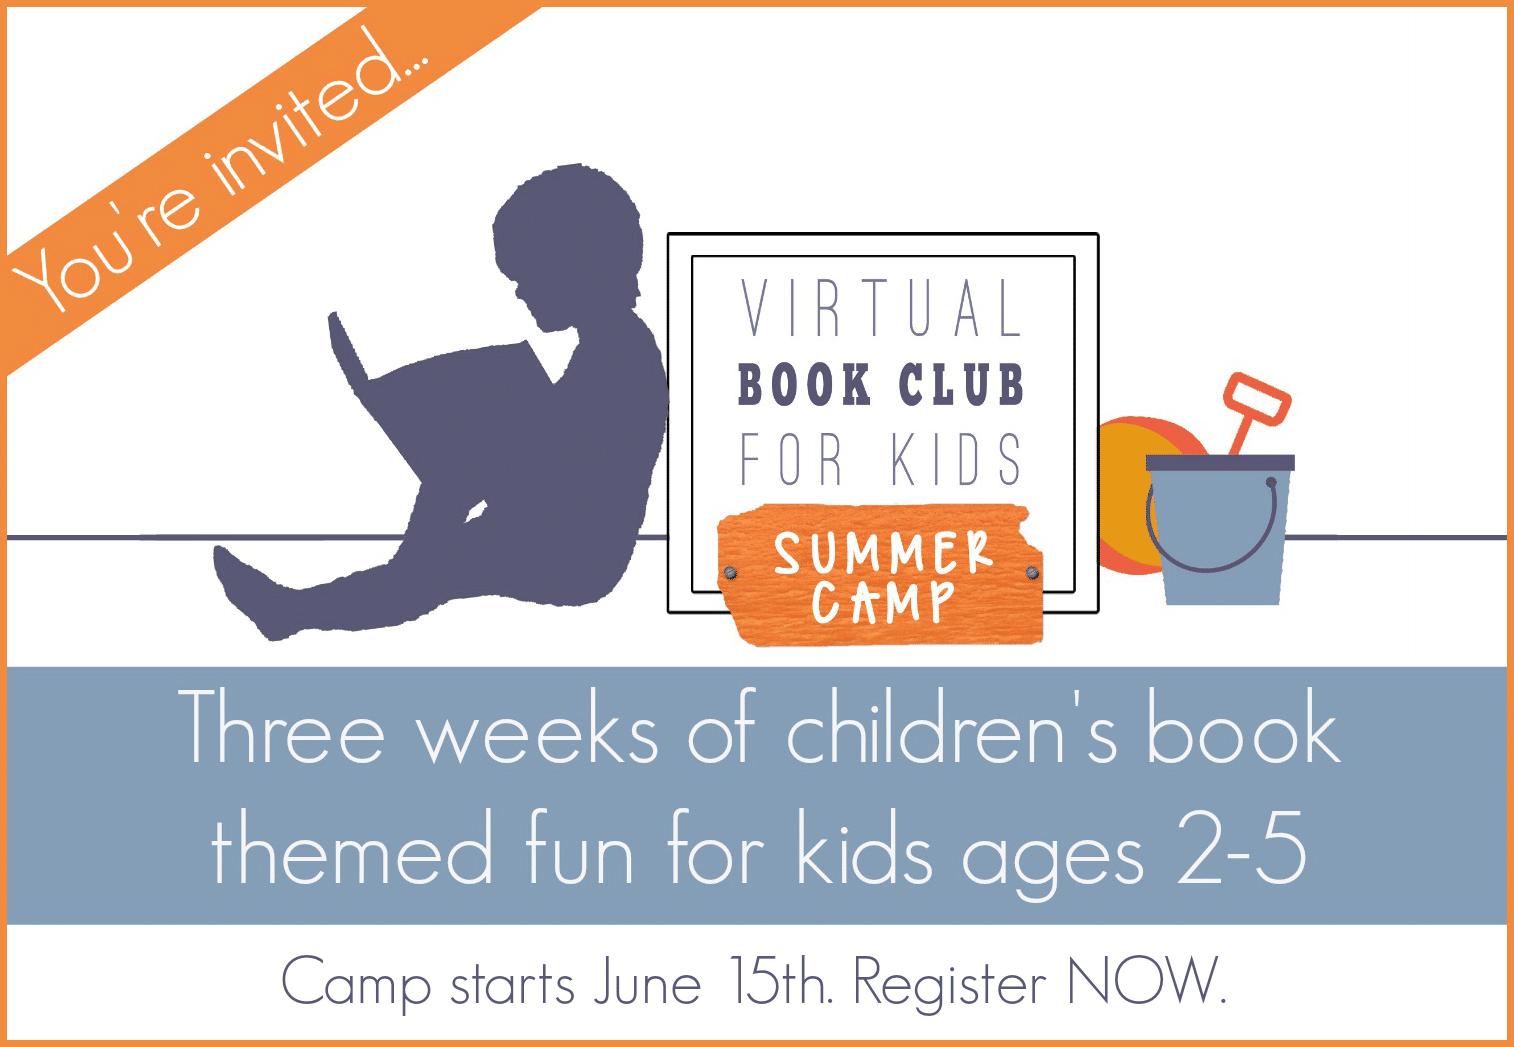 Virtual Book Club for Kids Summer Camp Registration